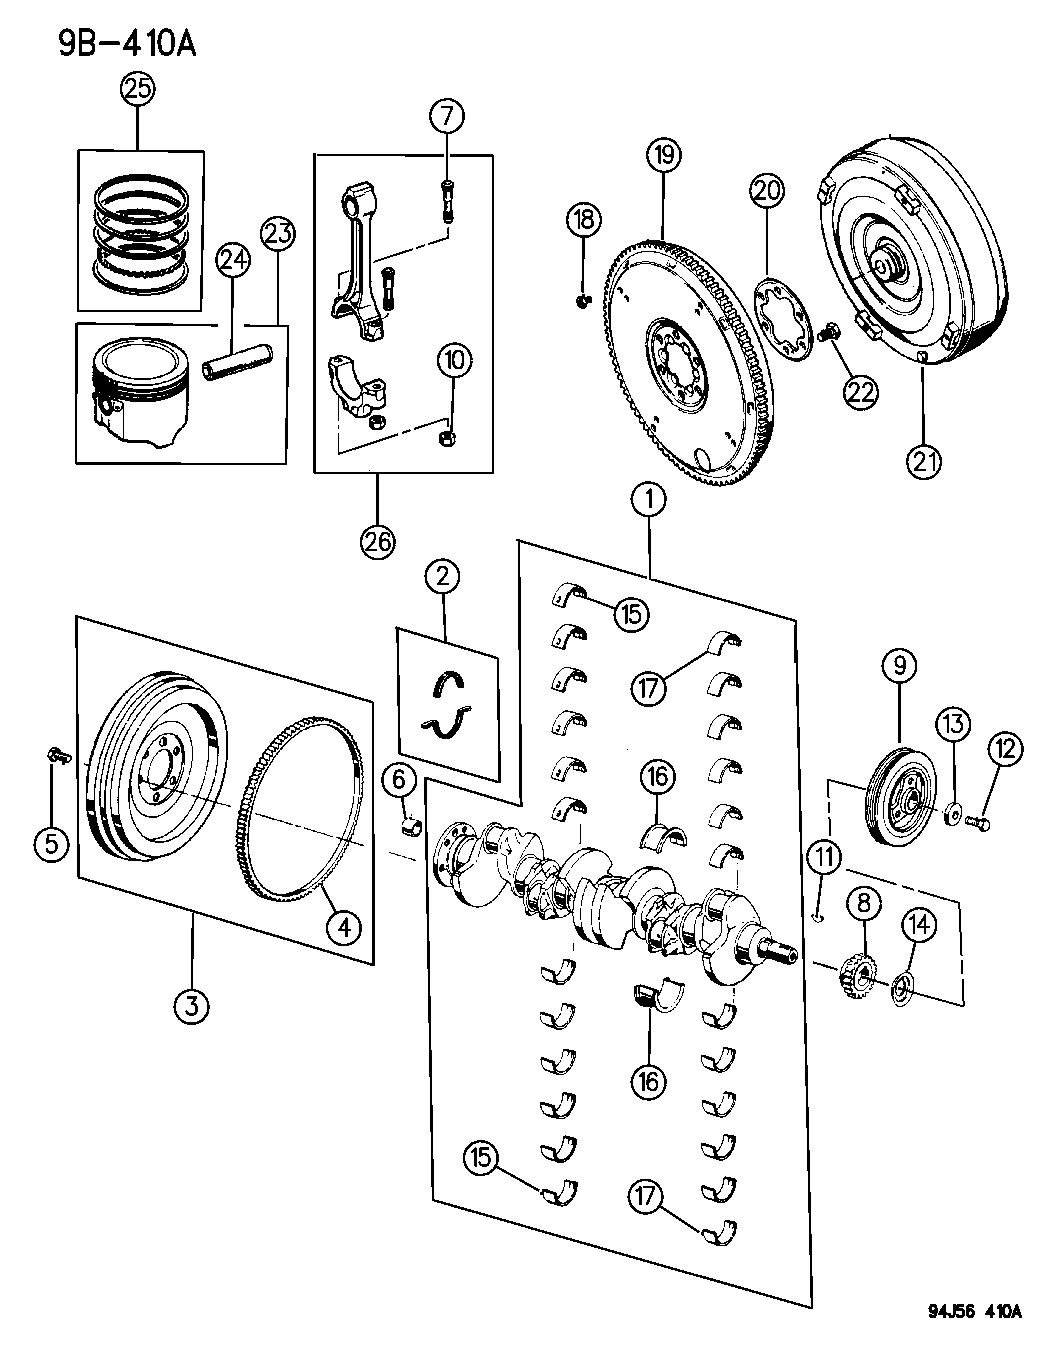 1996 Jeep Grand Cherokee Crankshaft, Piston And Torque